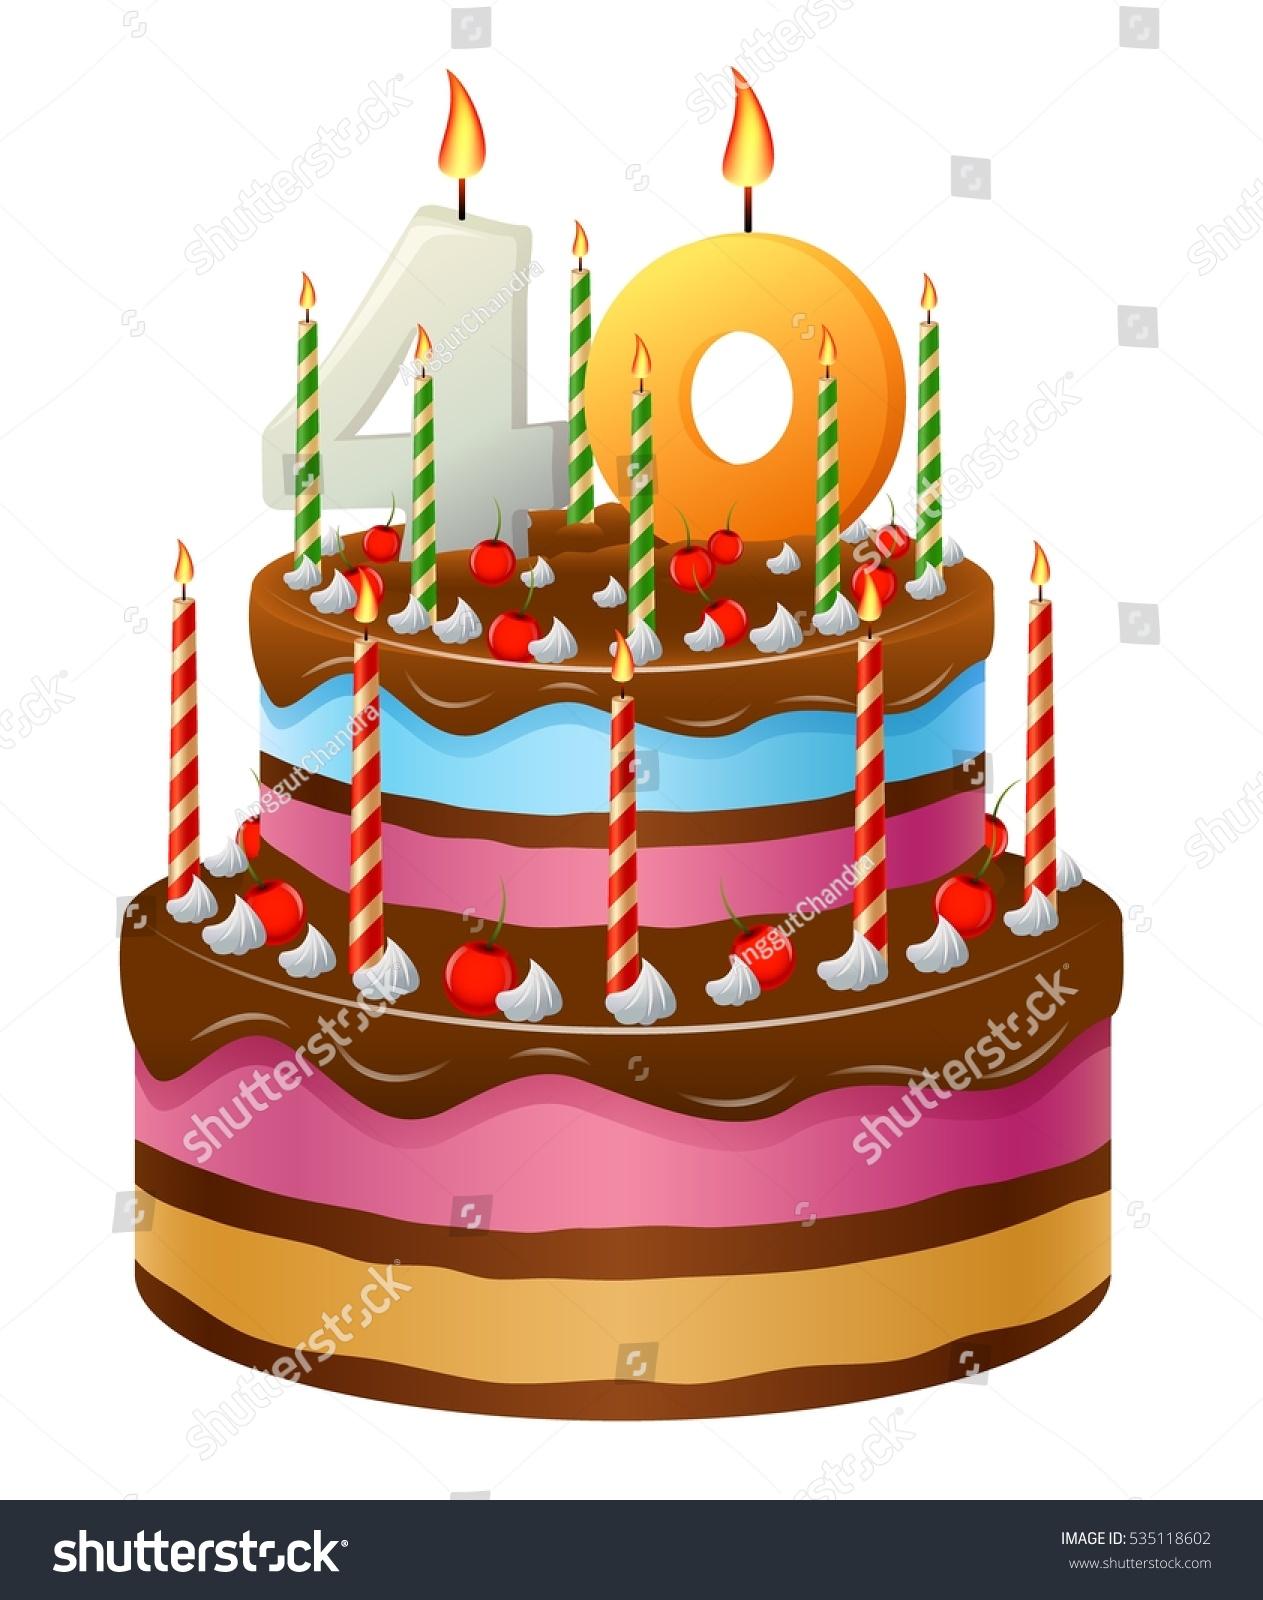 Happy Birthday Cake 40 Stock Vector Royalty Free 535118602